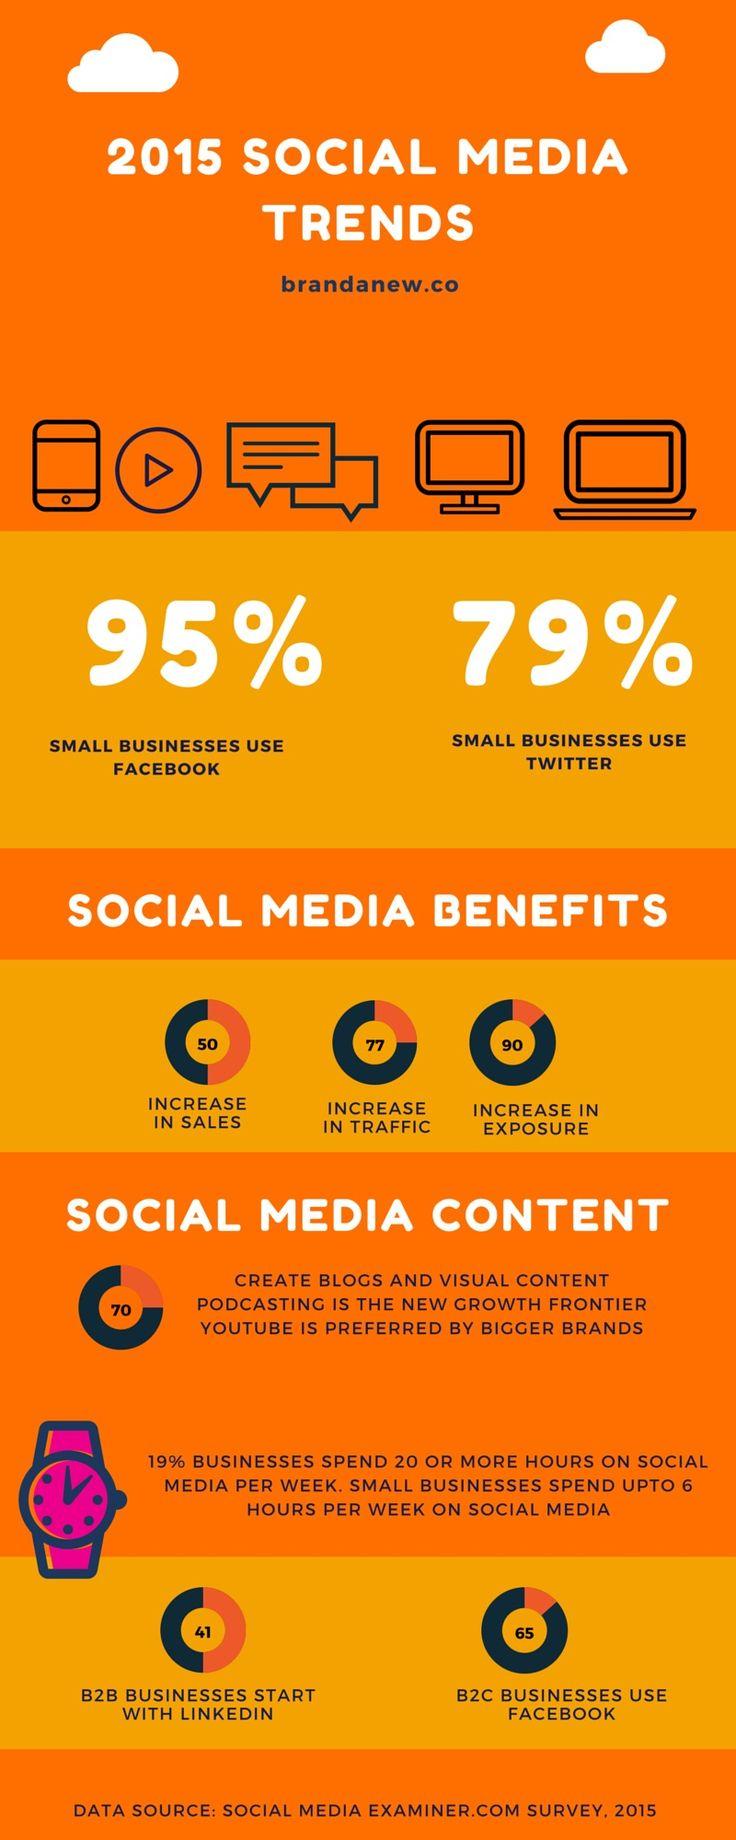 5 Social Media Trends For Small Businesses #socialmedia #trends #infographic